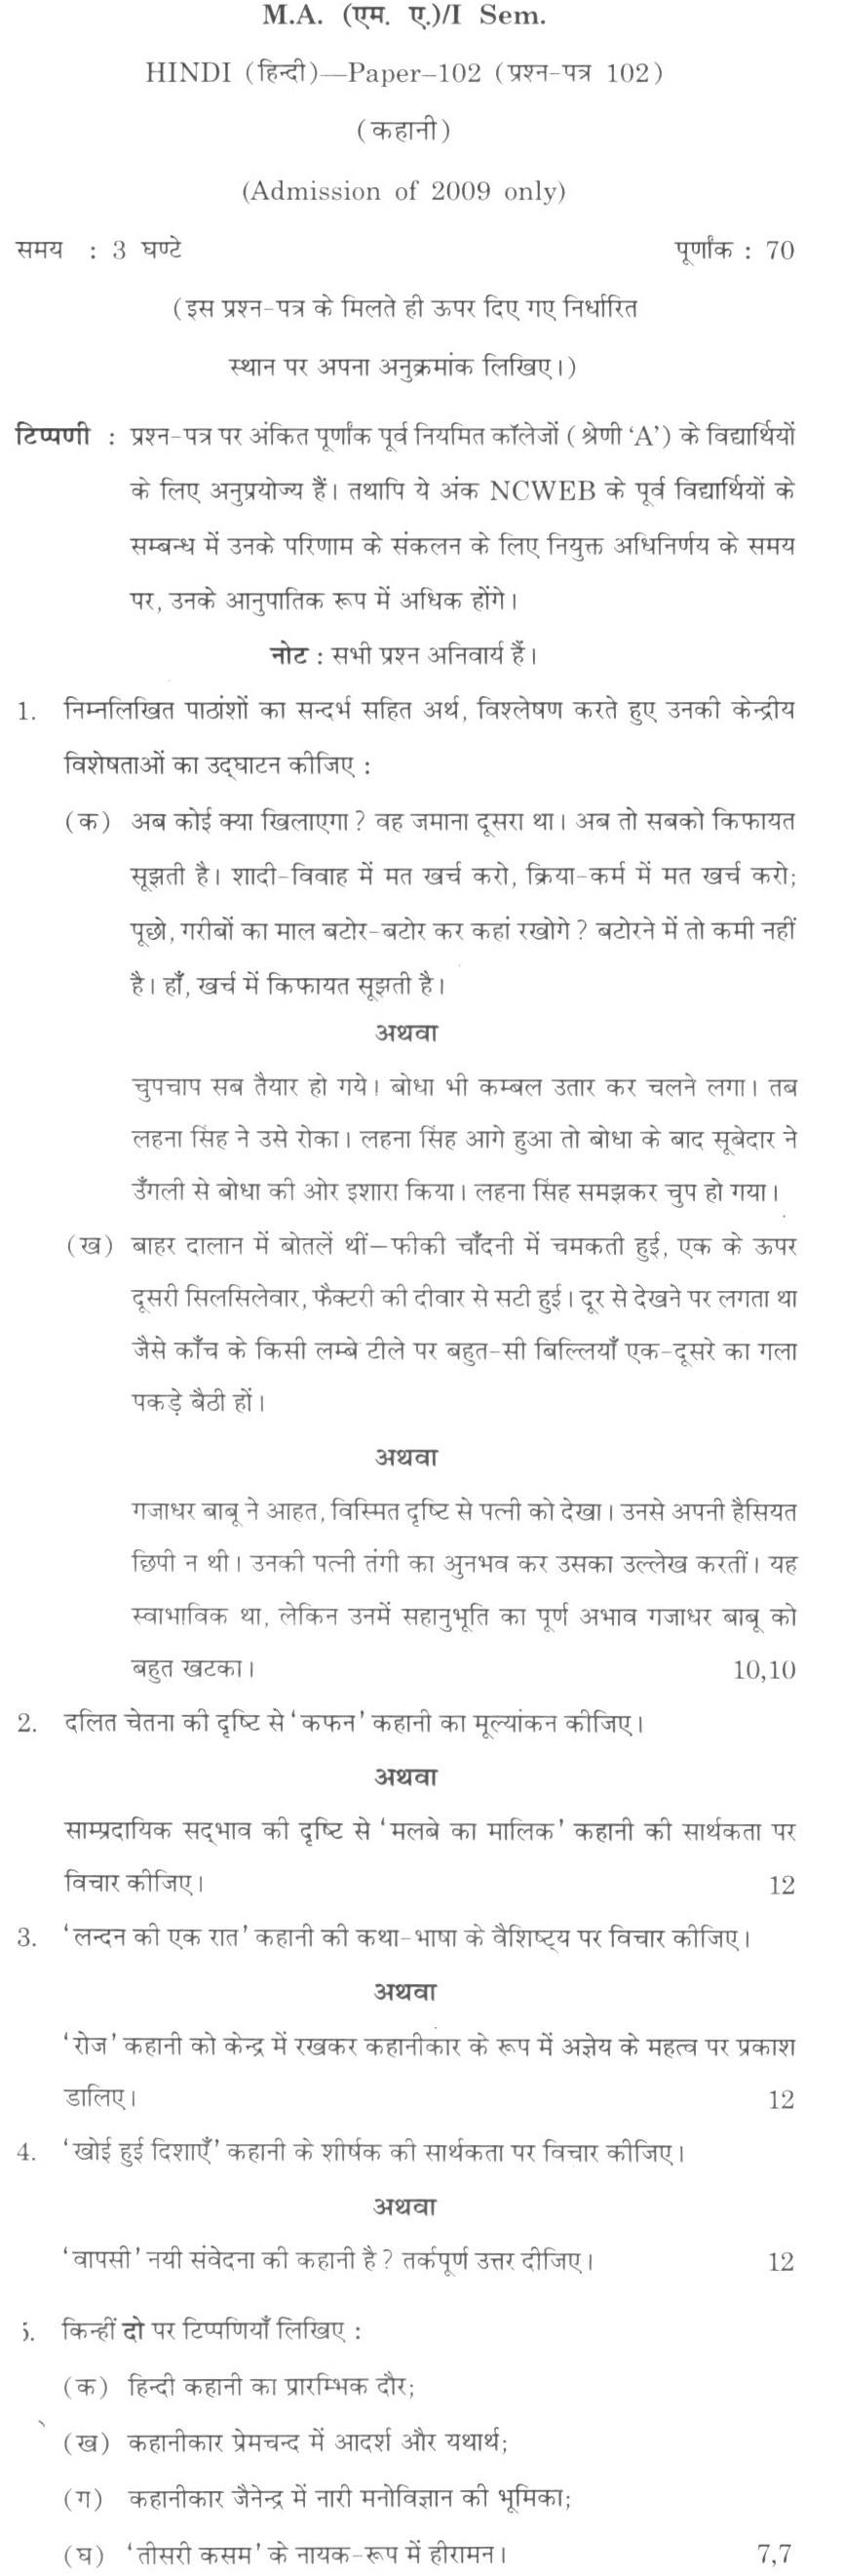 DU SOL M.A. Hindi Question Paper - ISemesterStories - Paper 102